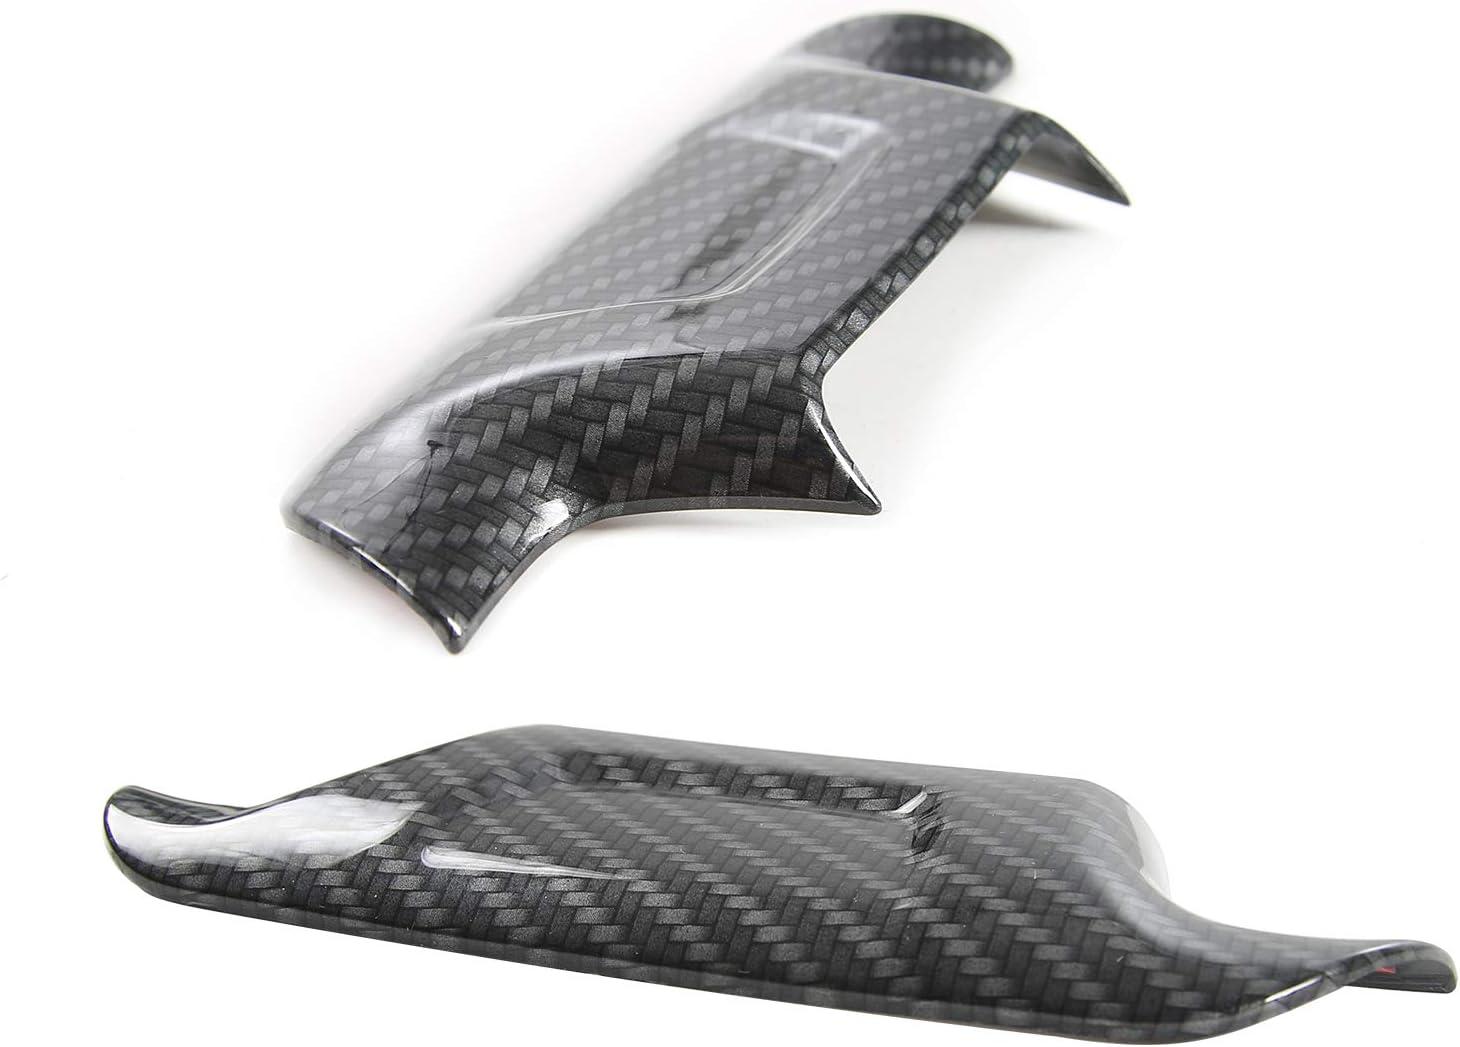 Voodonala for Camaro Accessories Steering Wheel Trim Decoration Cover for Chevrolet Camaro 2017 Up Carbon Fiber Grain 1Pc